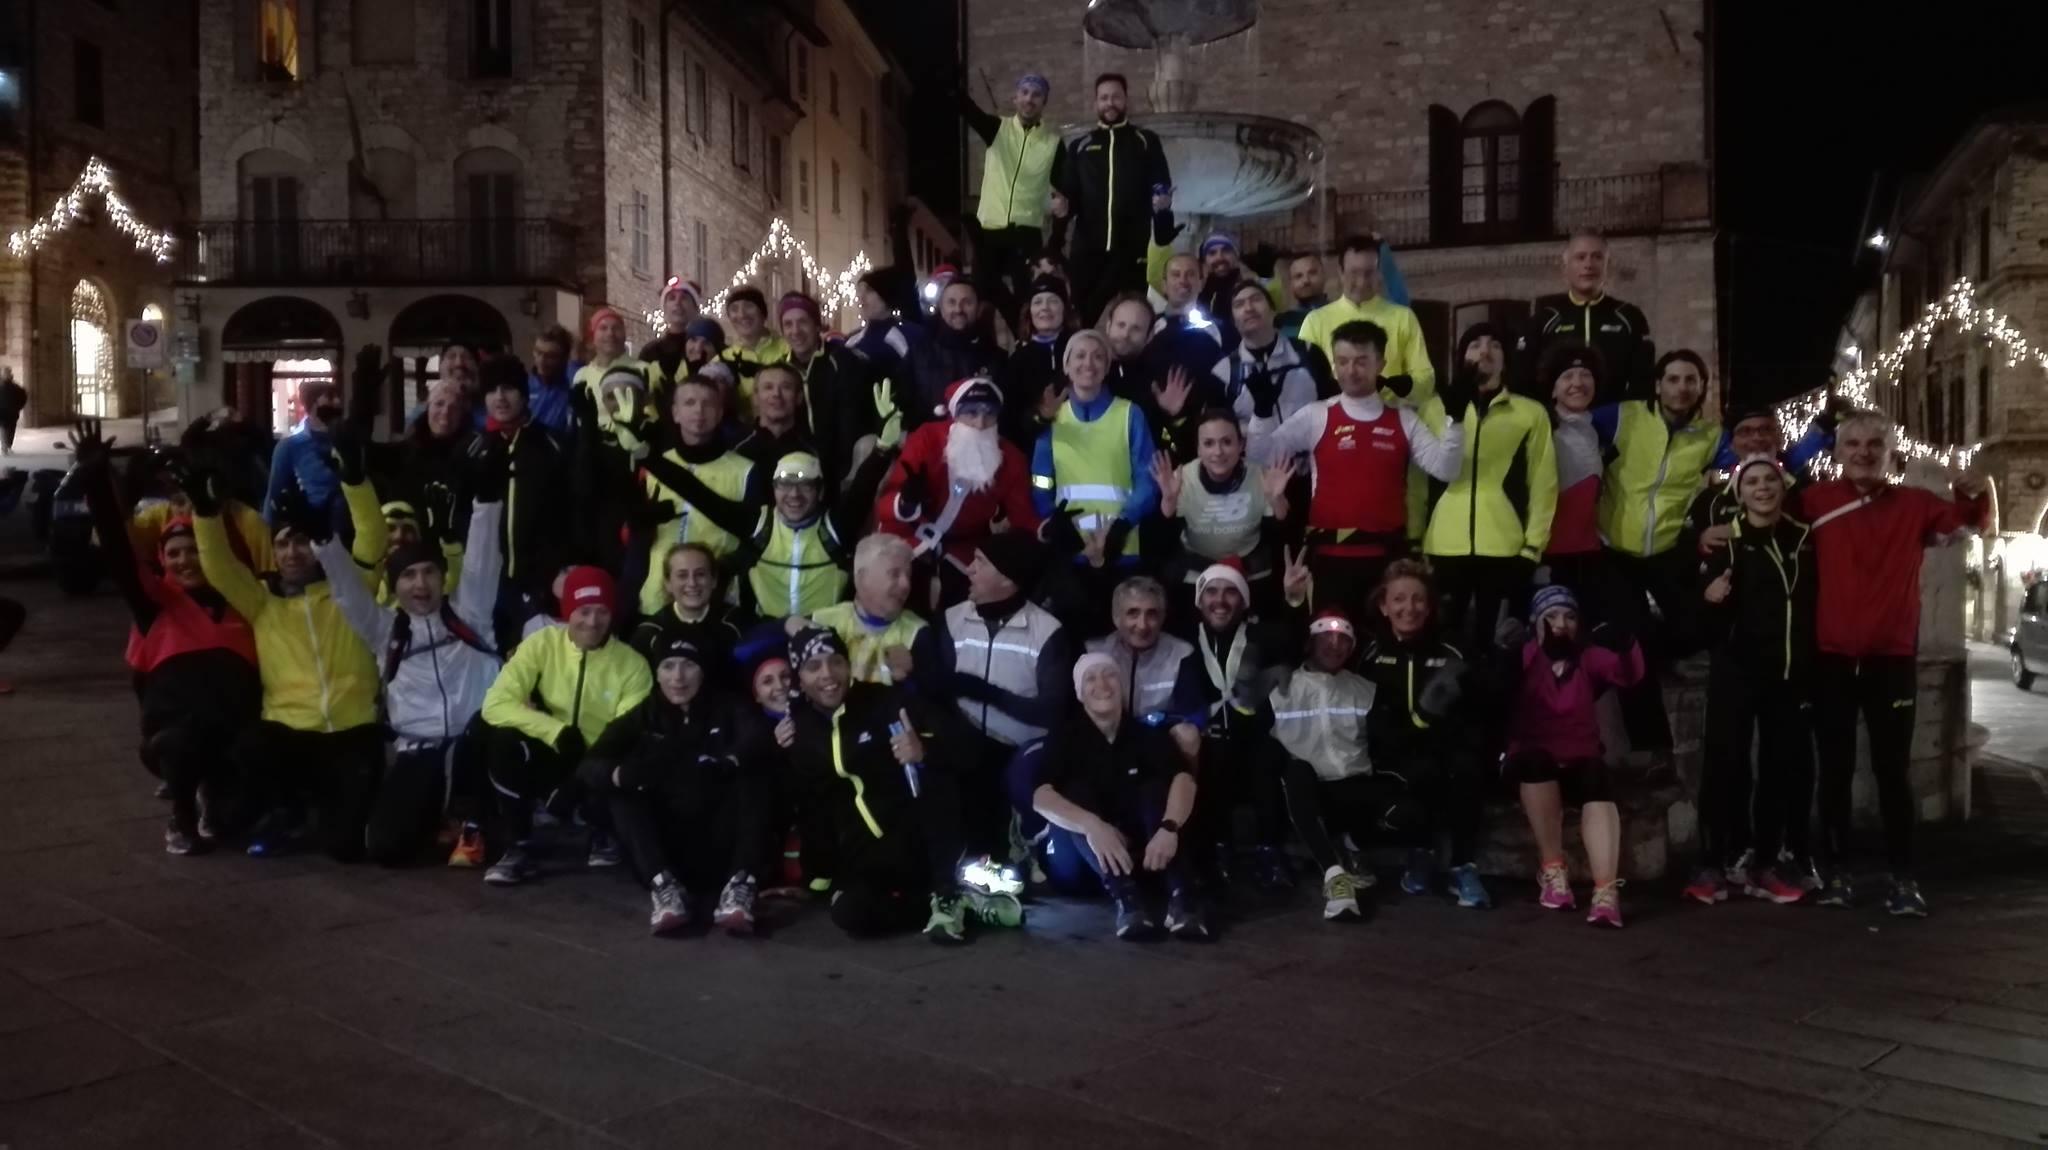 brindisi-rocca-2015-3